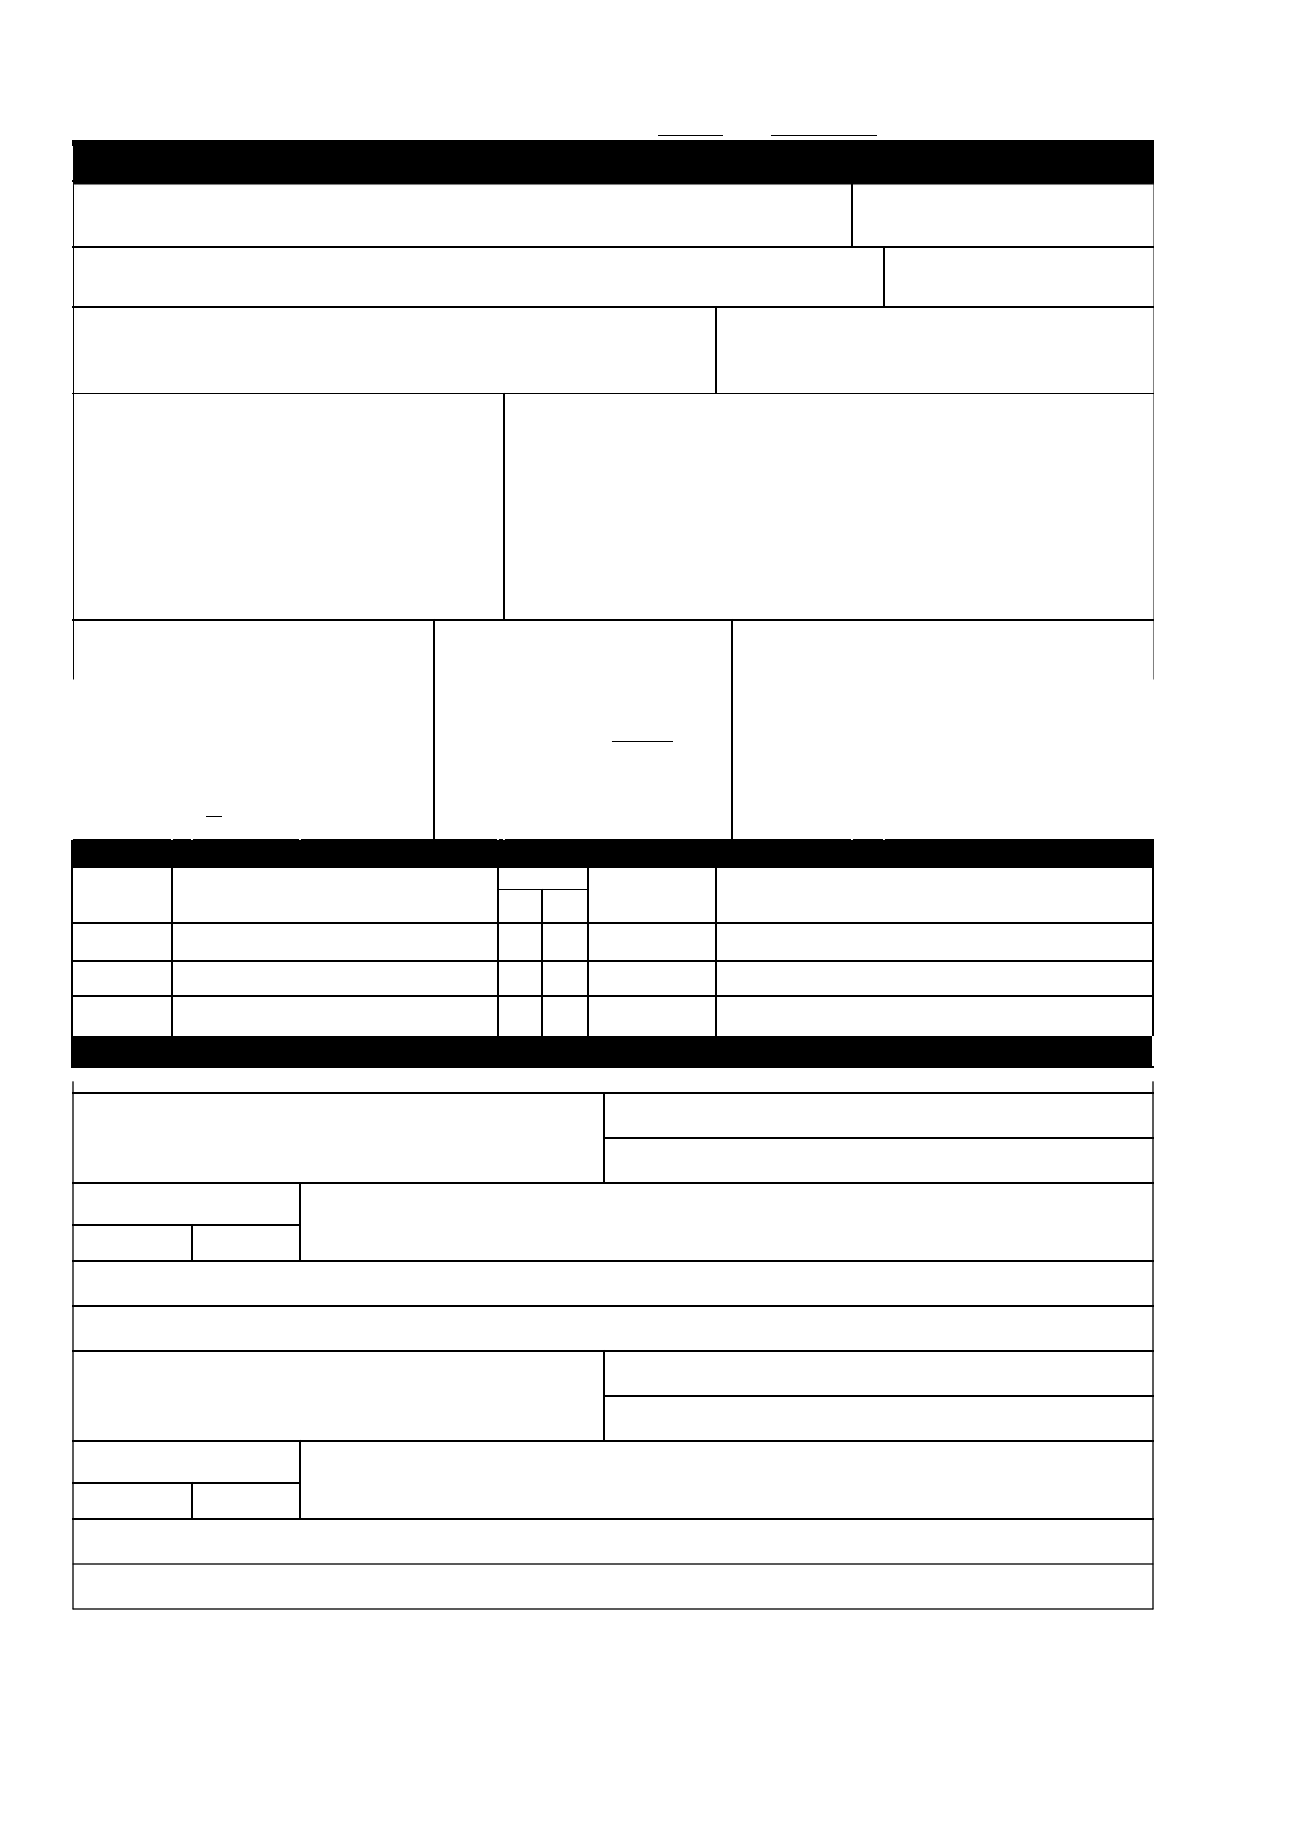 Free Printable Panera Bread Job Application Form